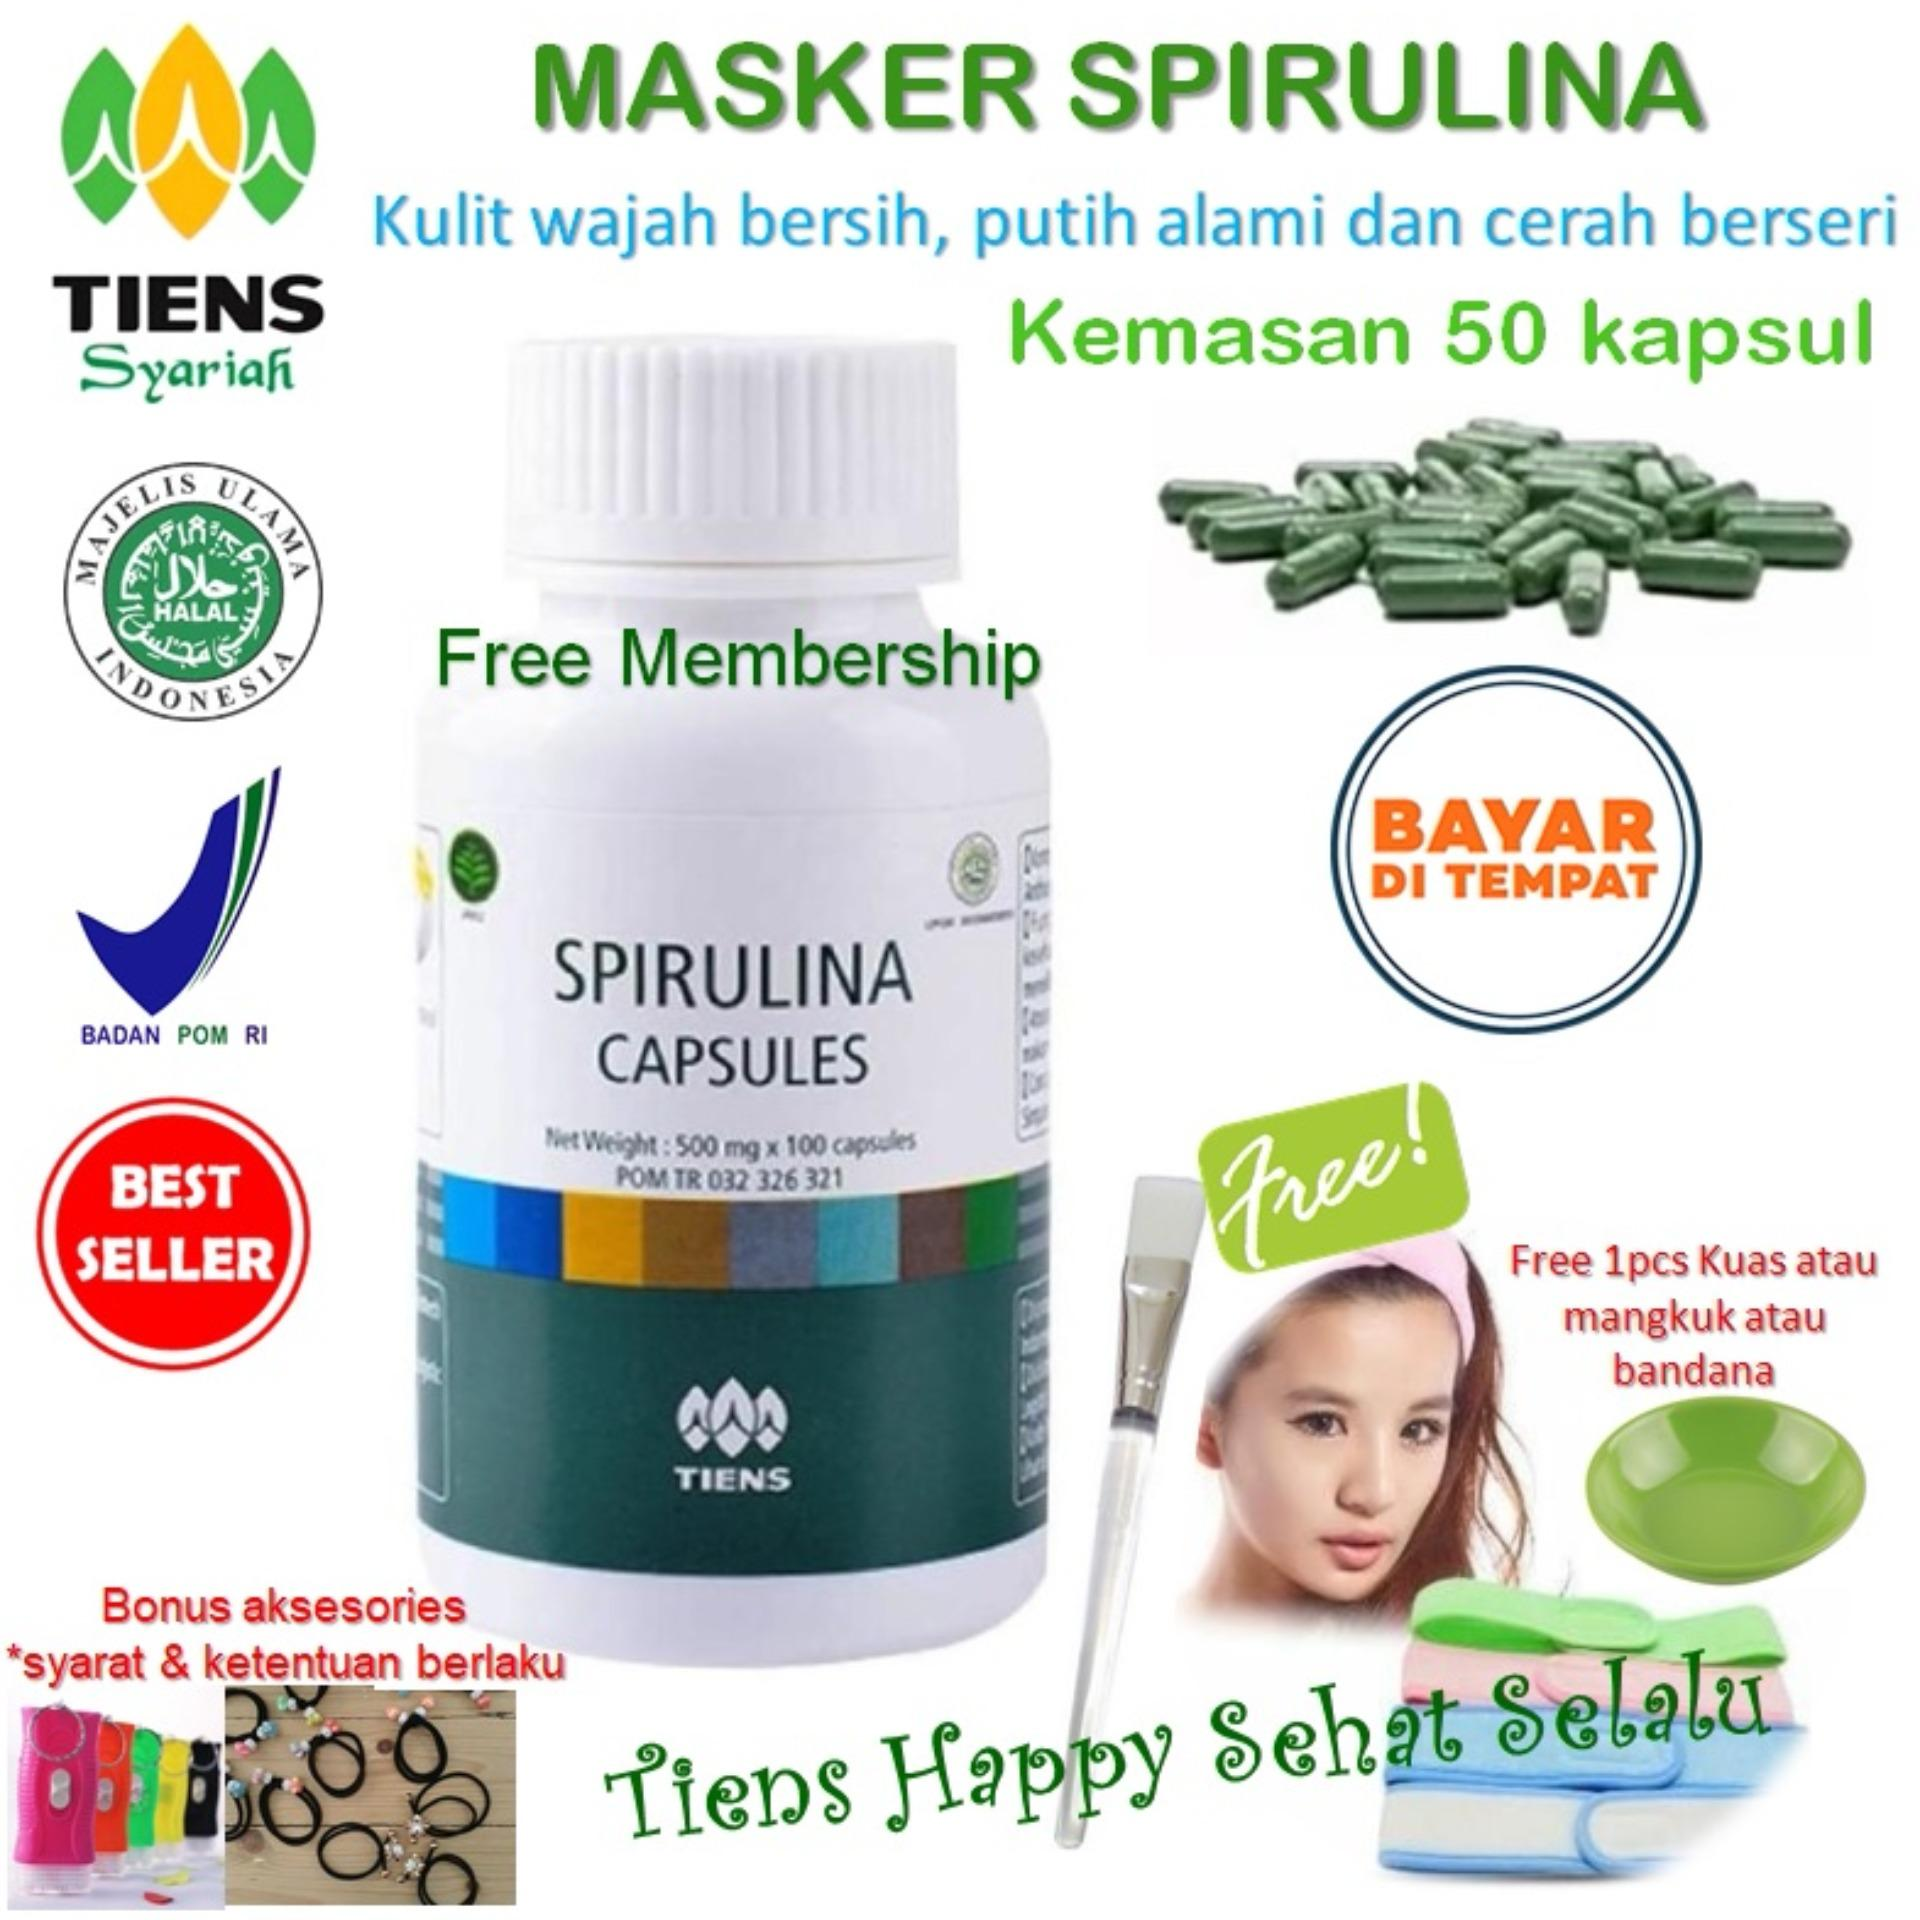 Top 10 Masker Tiens Spirulina Herbal Pemutih Wajah Isi 50 Kapsul Promo Online